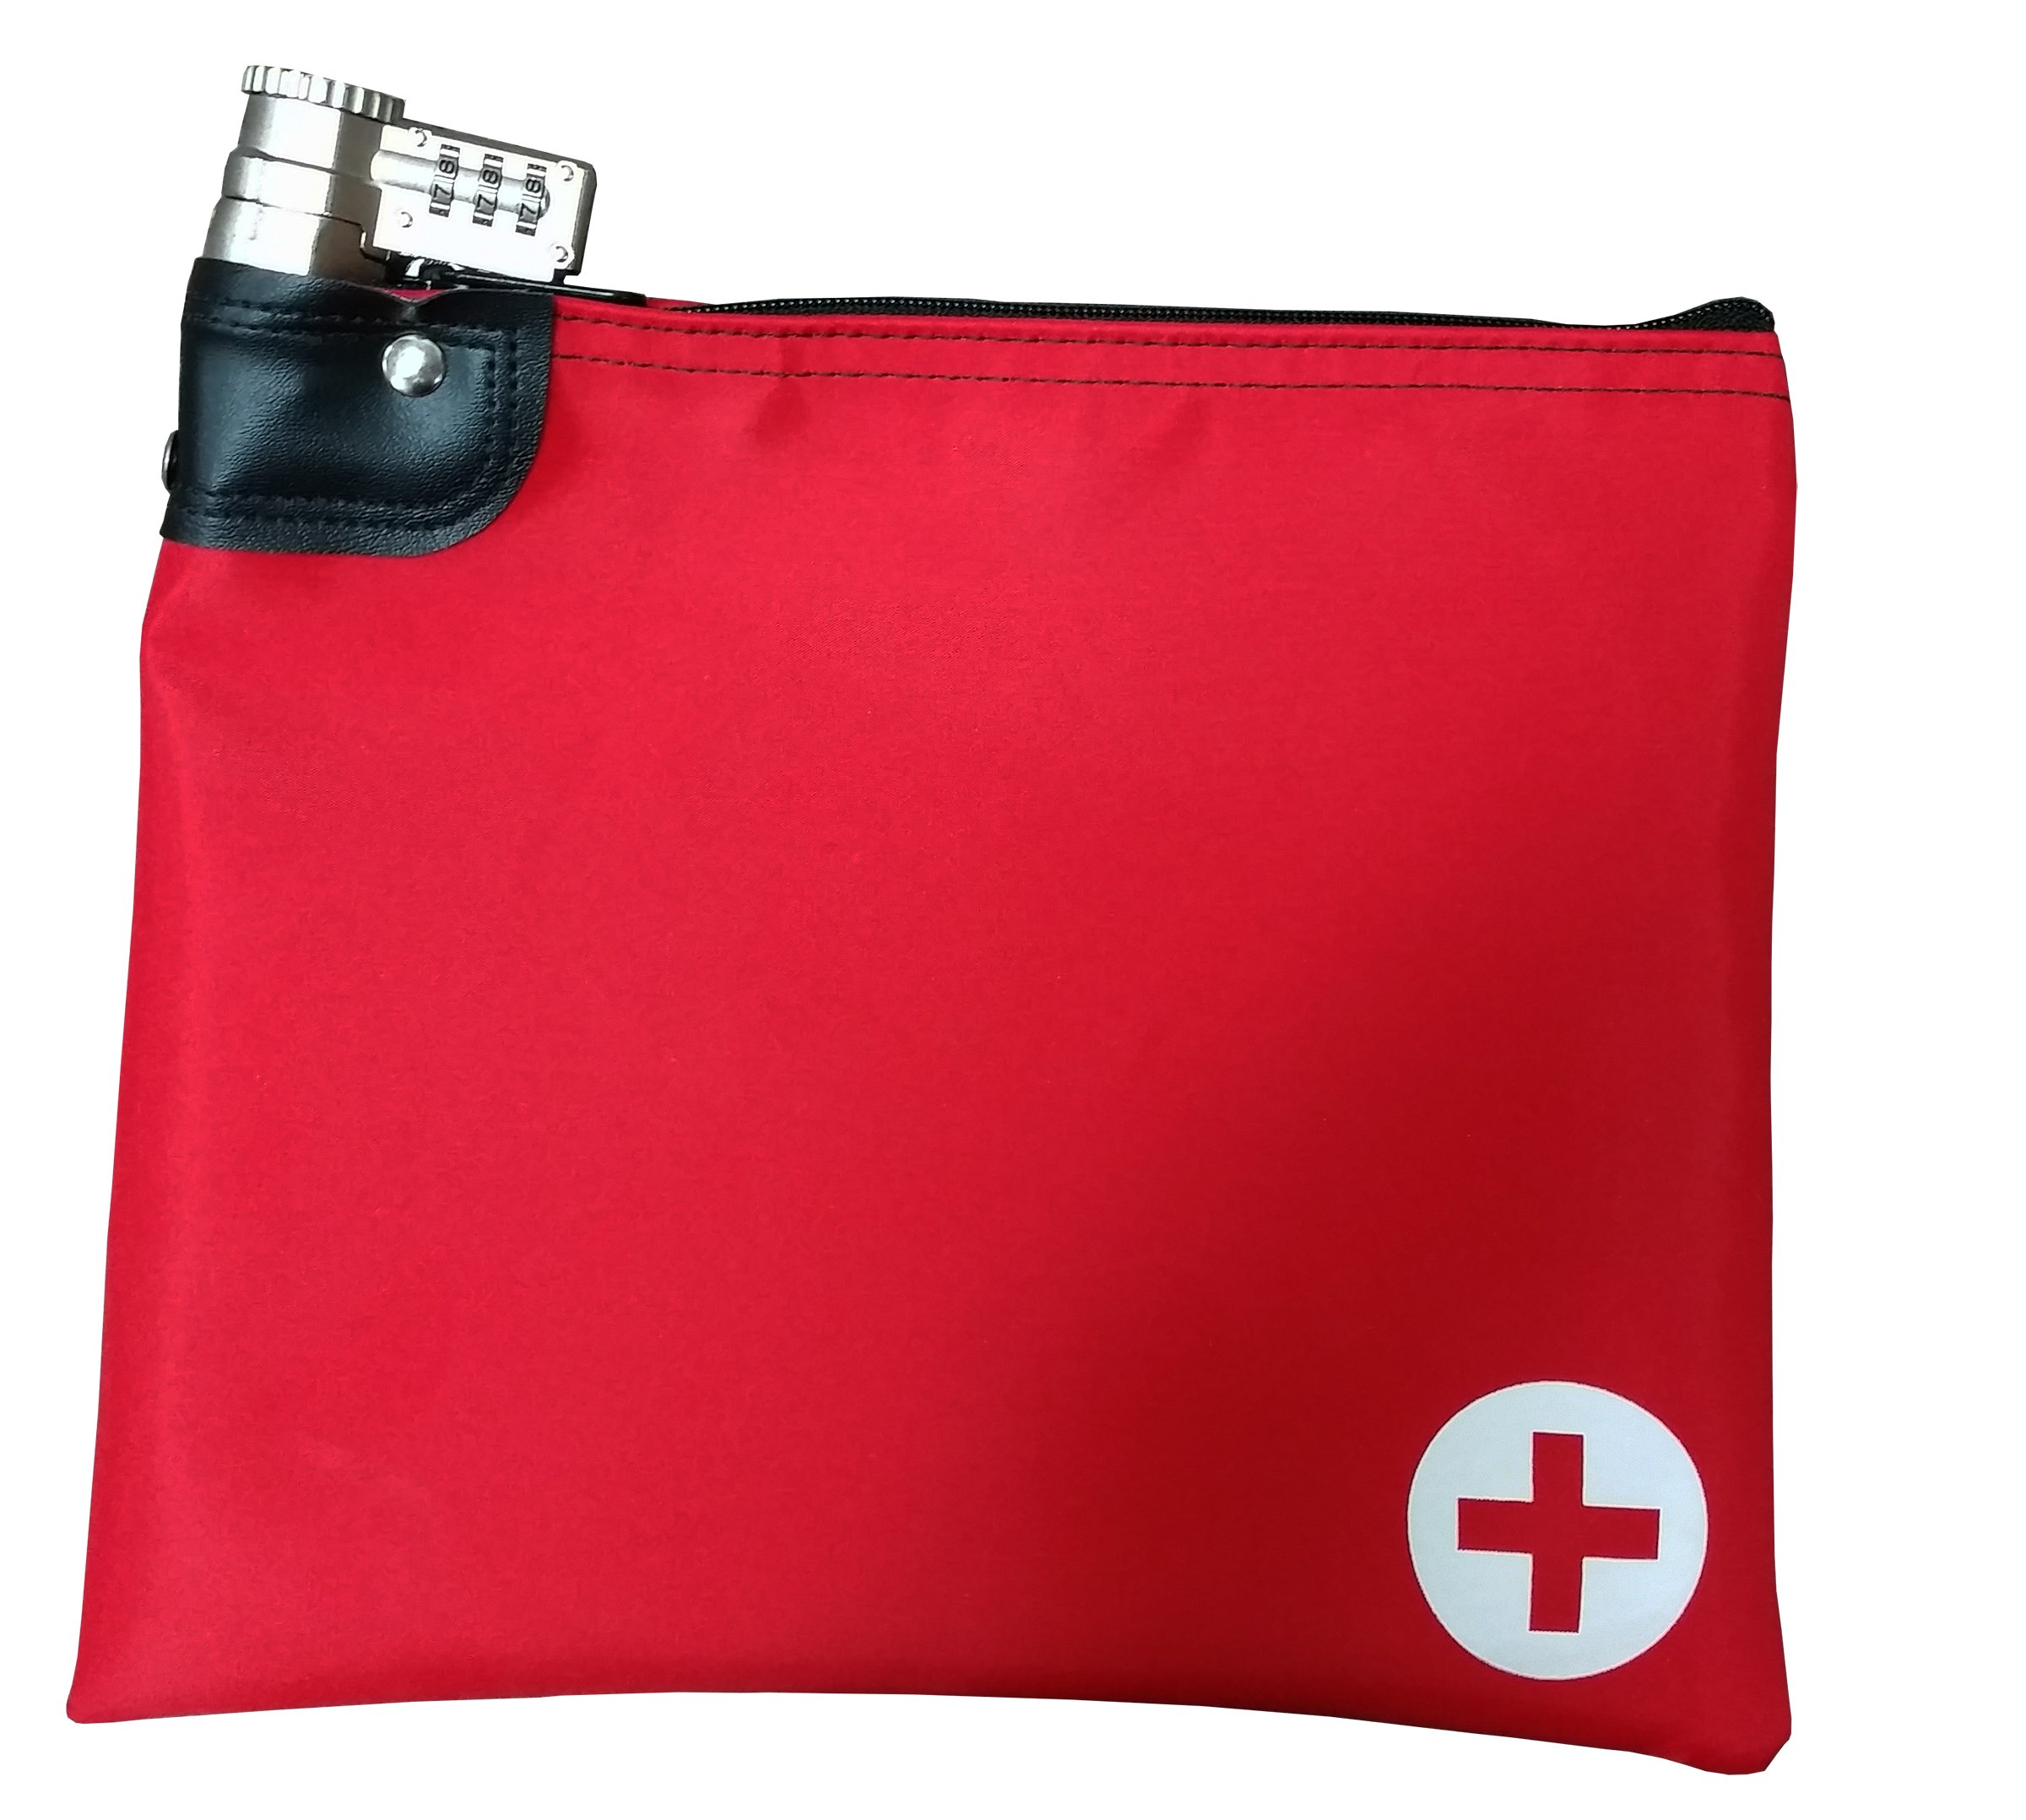 Medication Safety Bag Combination Keyed Lock (Red)